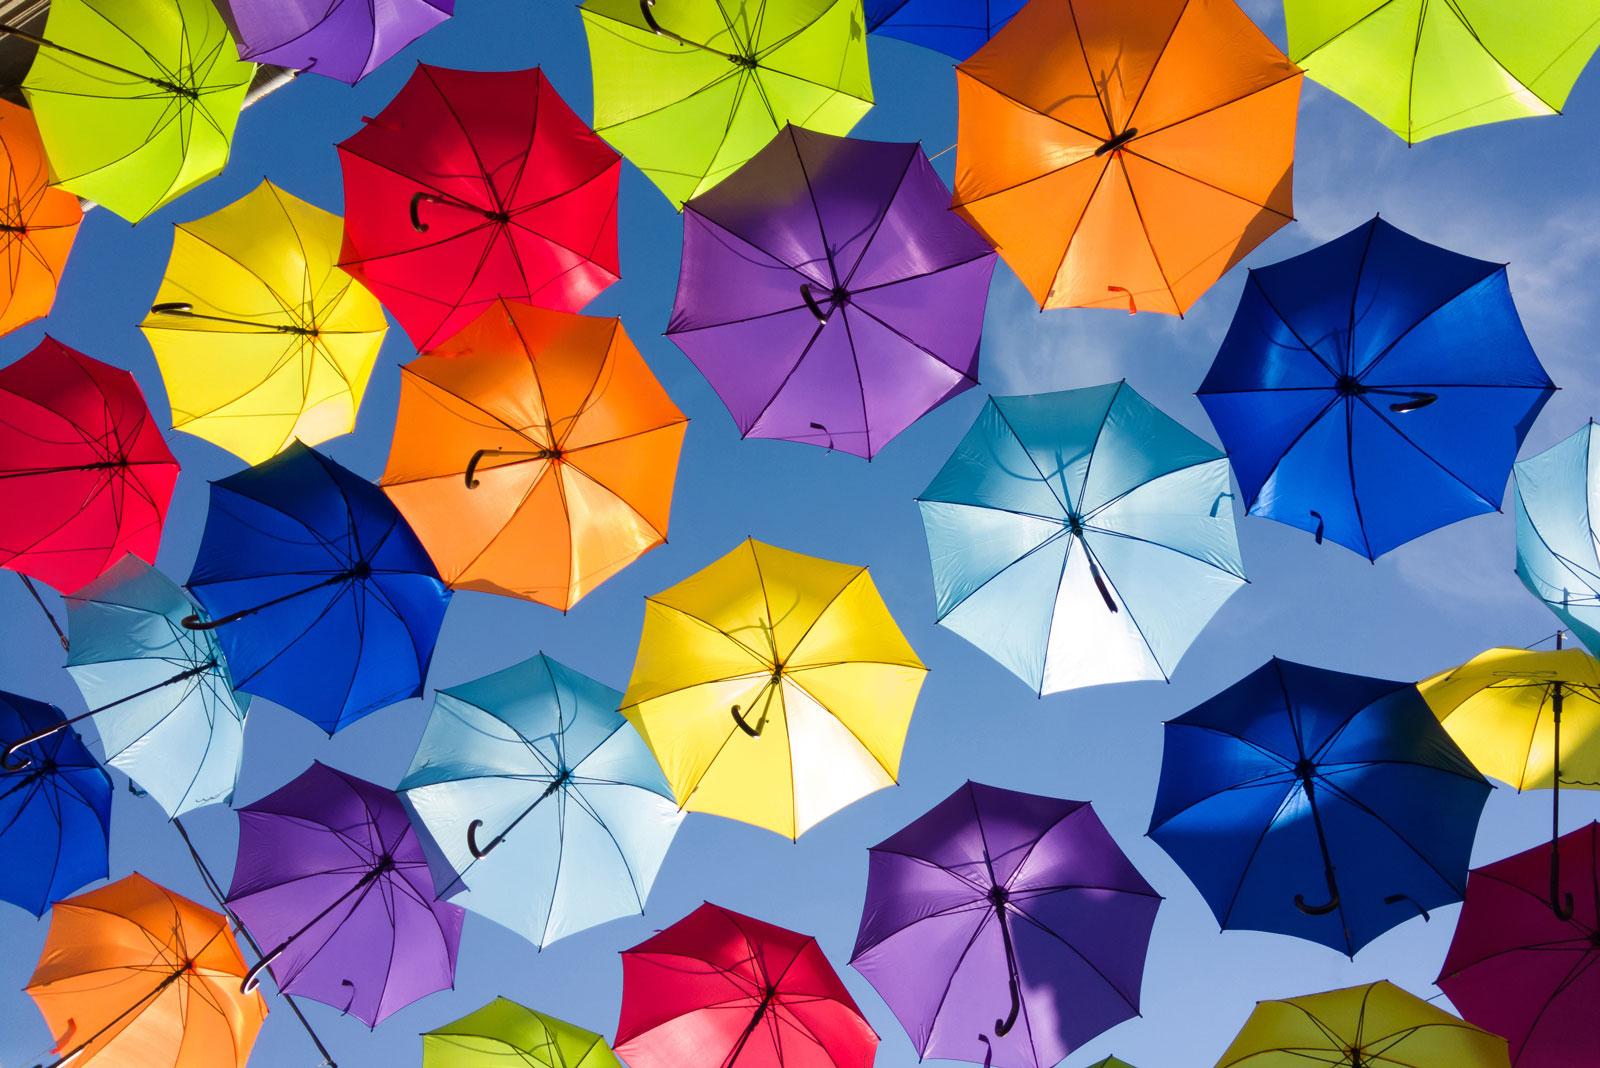 colorful-umbrellas-in-the-sky-street-dec